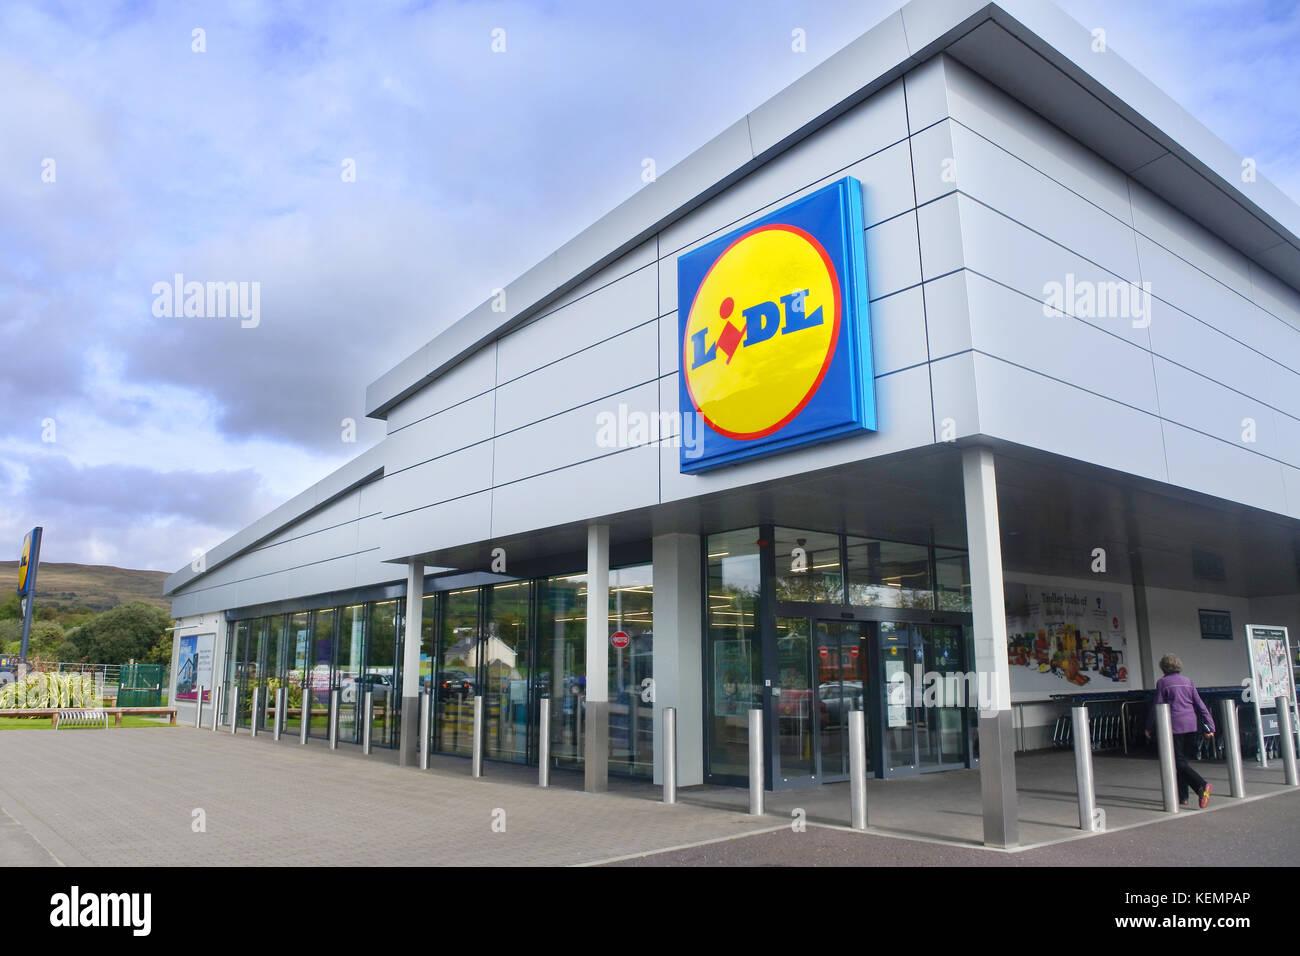 Lidl Supermarket, Kenmare, County Kerry, Ireland - John Gollop - Stock Image